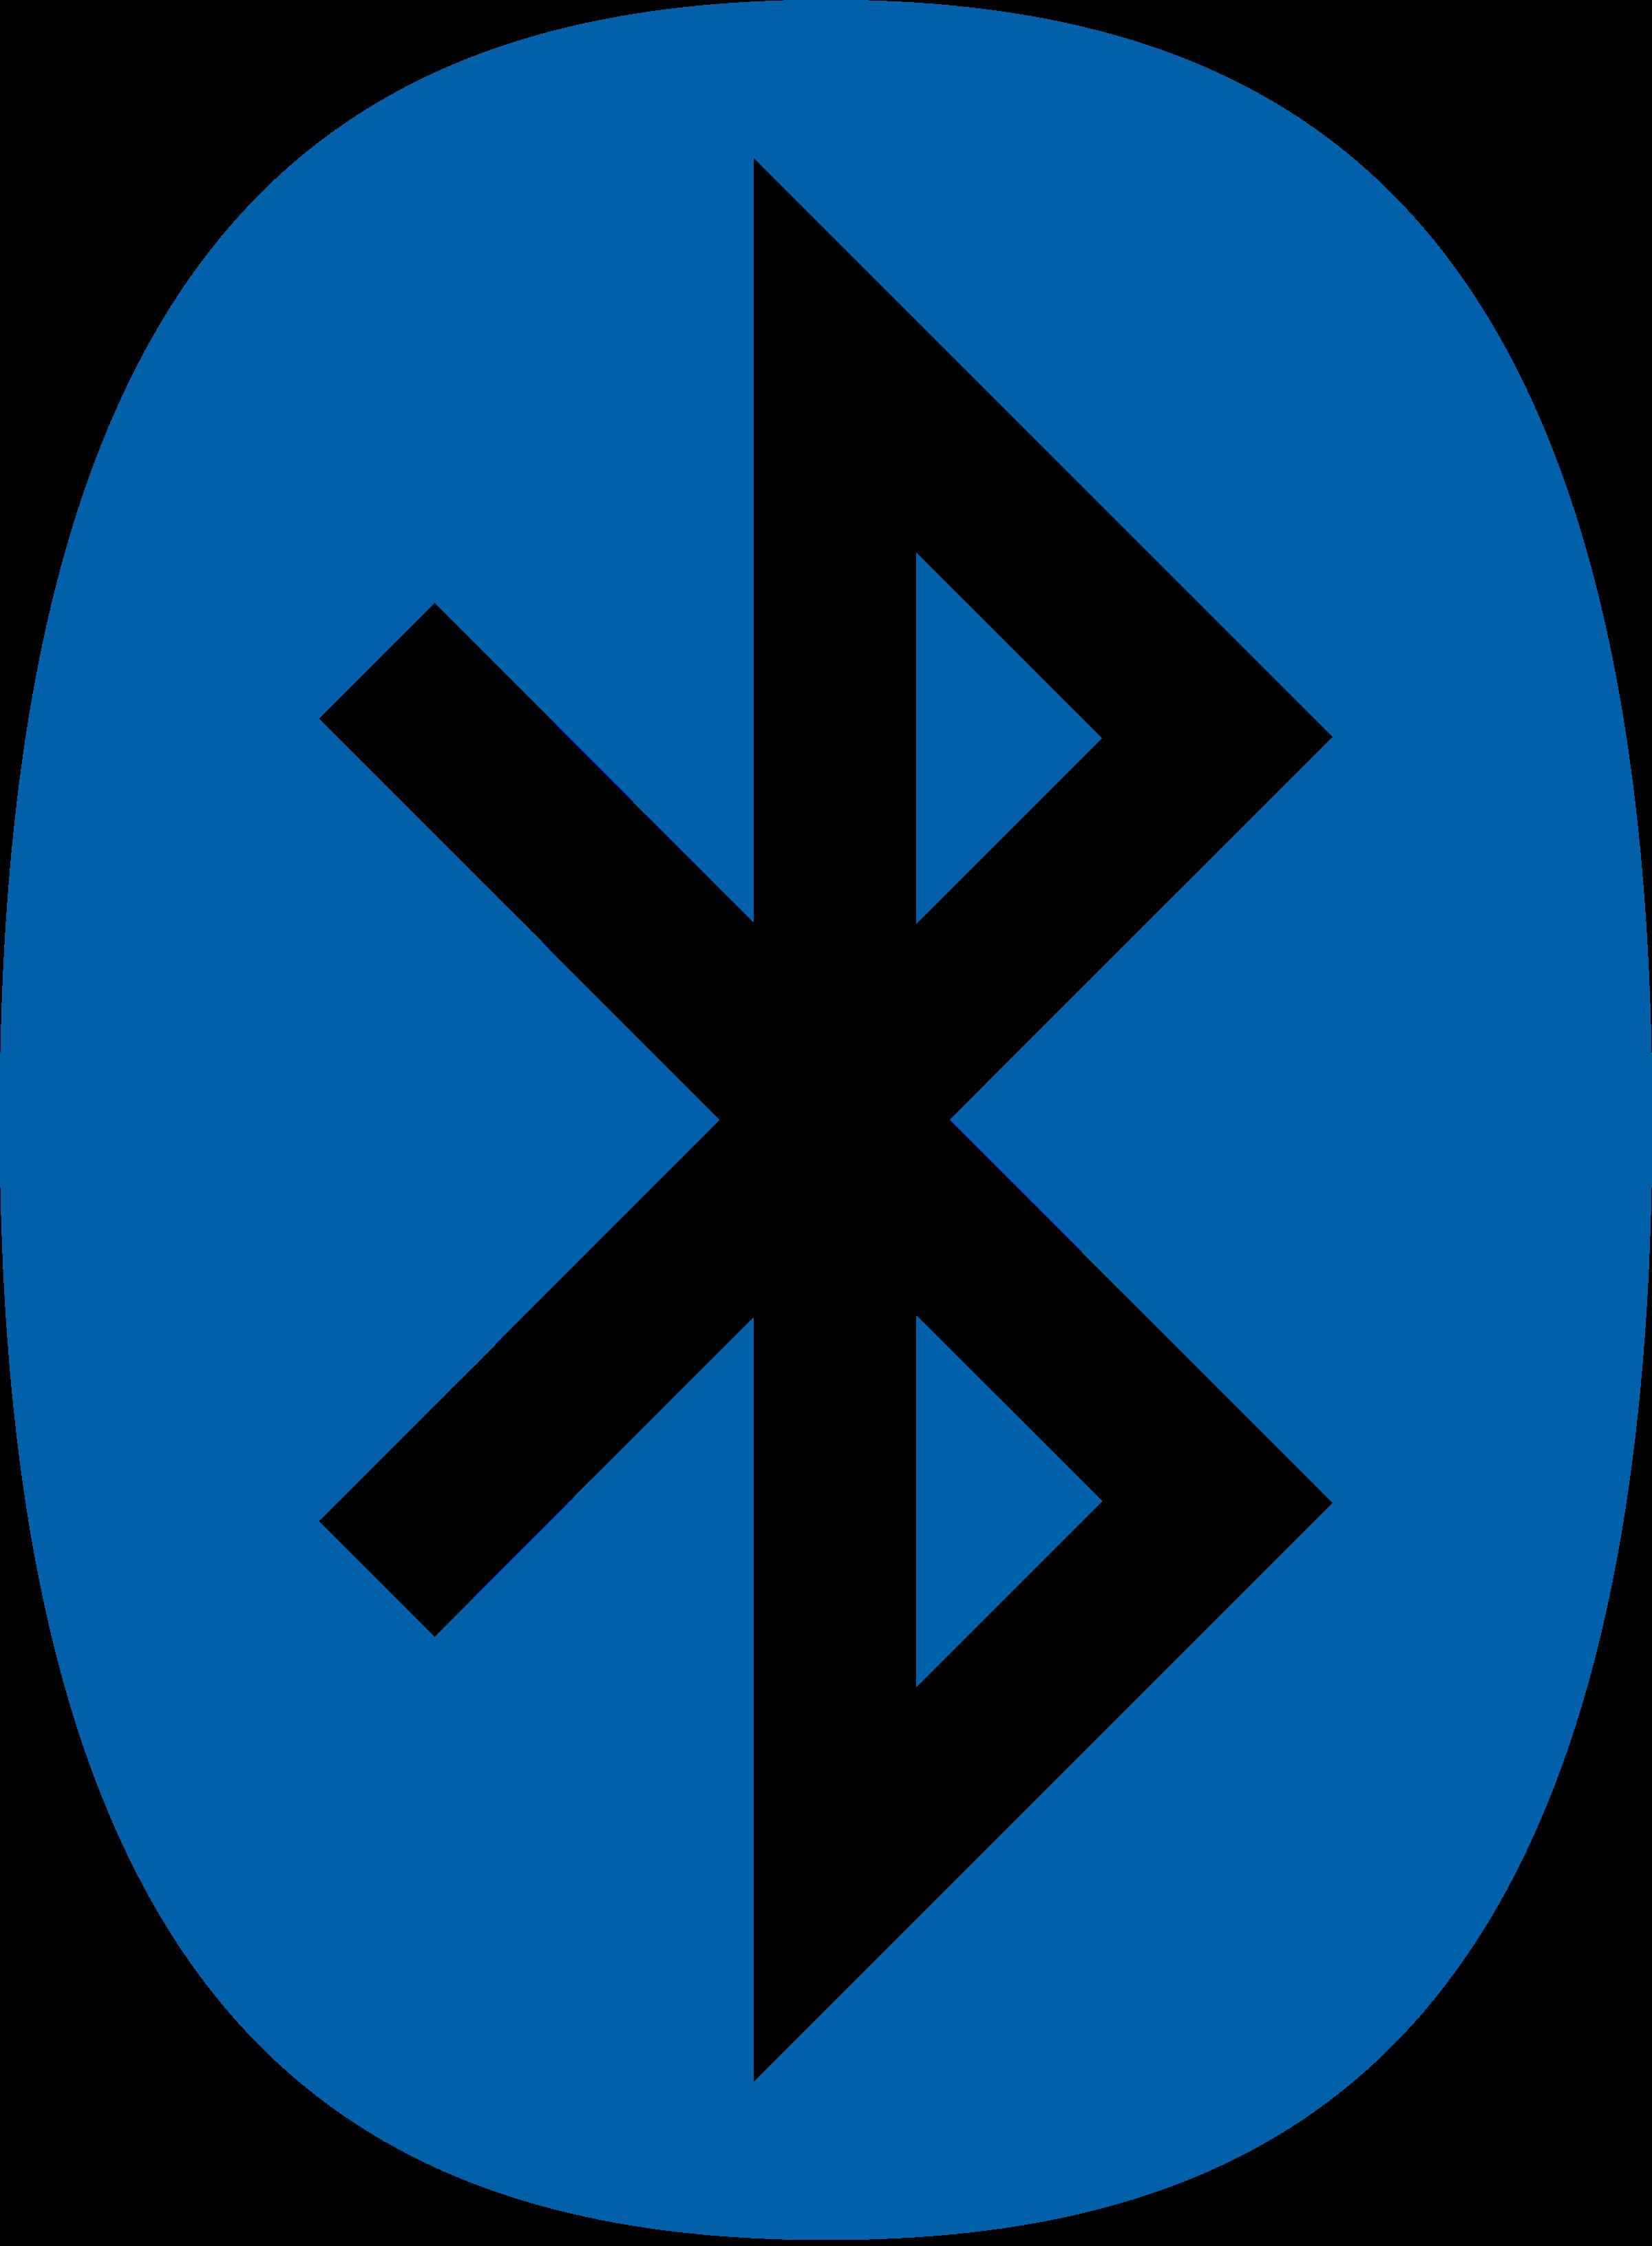 Bluetooth логотип PNG